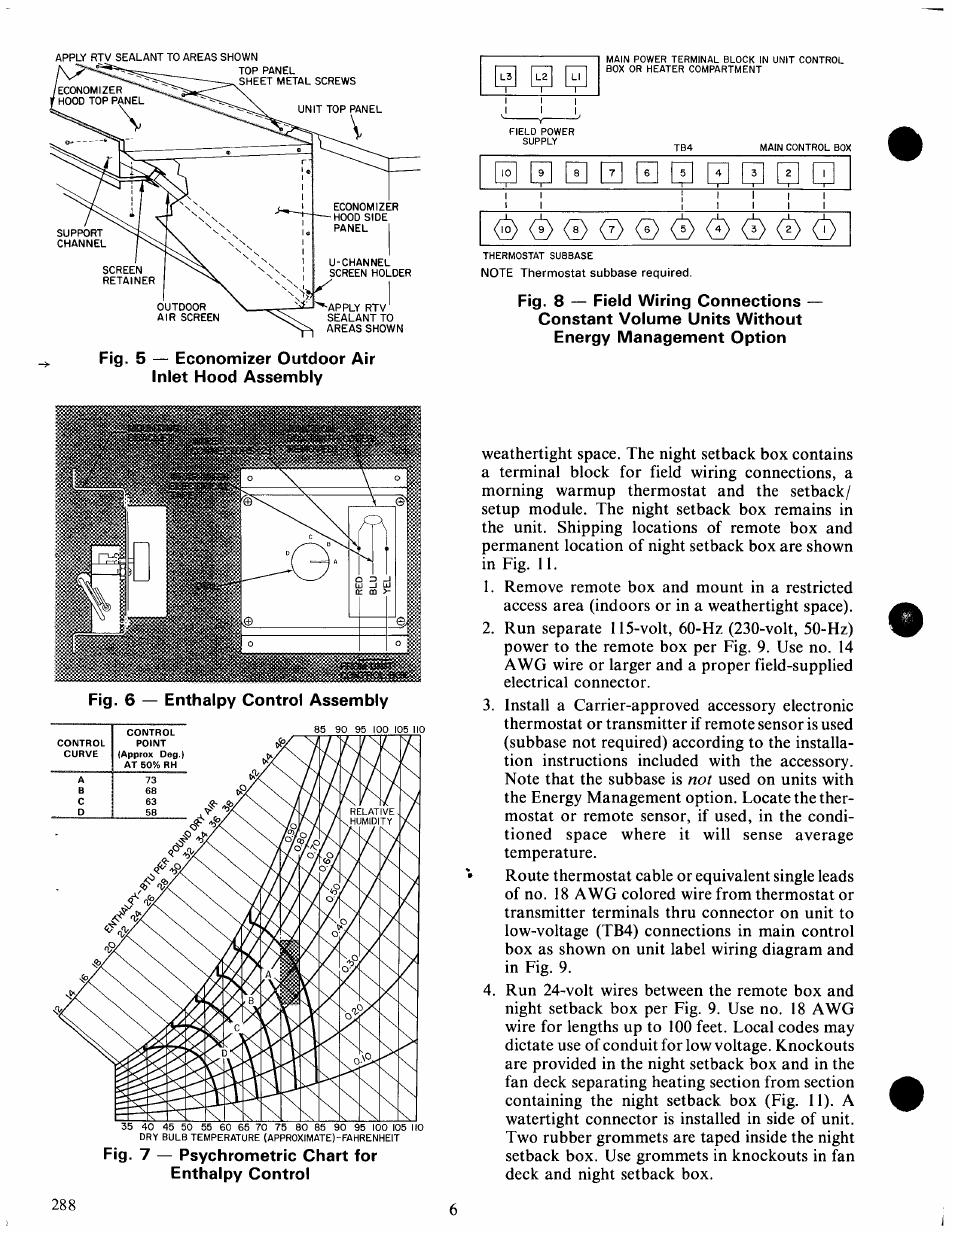 California Economizer Wiring Diagram Trusted Fahrenheit Carrier Trane Thermostat Humidifier